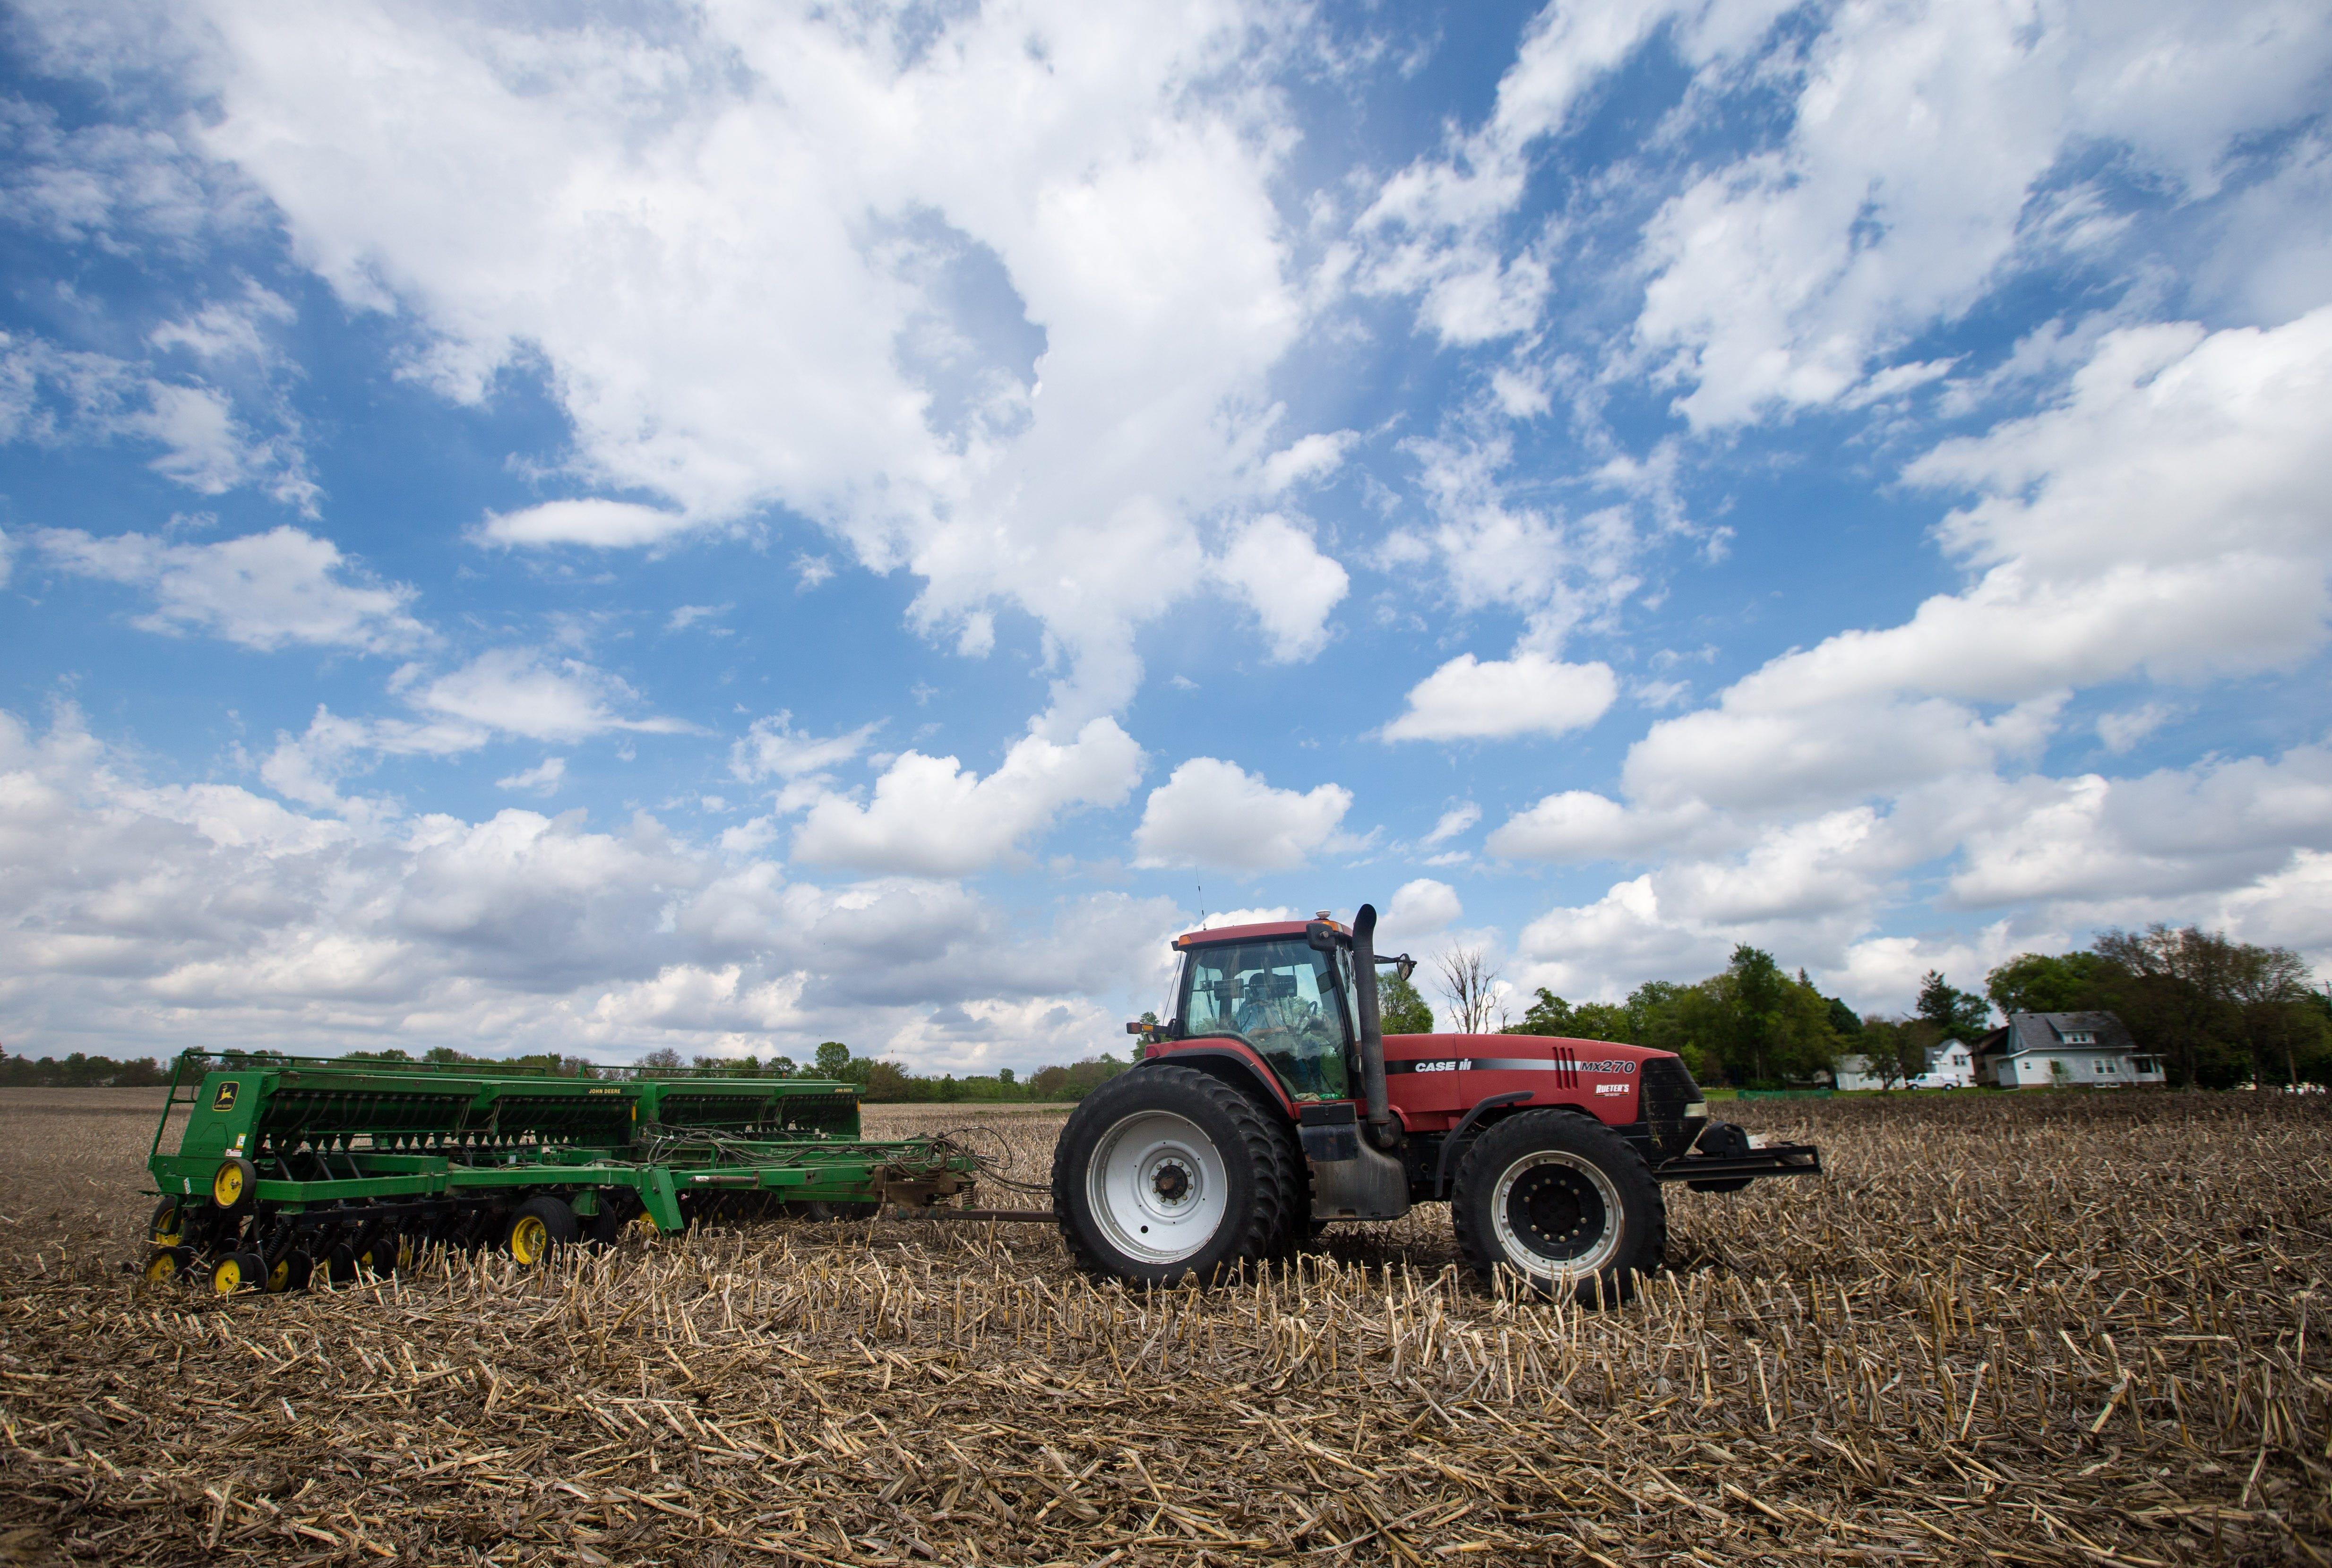 Reuters: USDA pulls staff from Iowa farm tour after threat